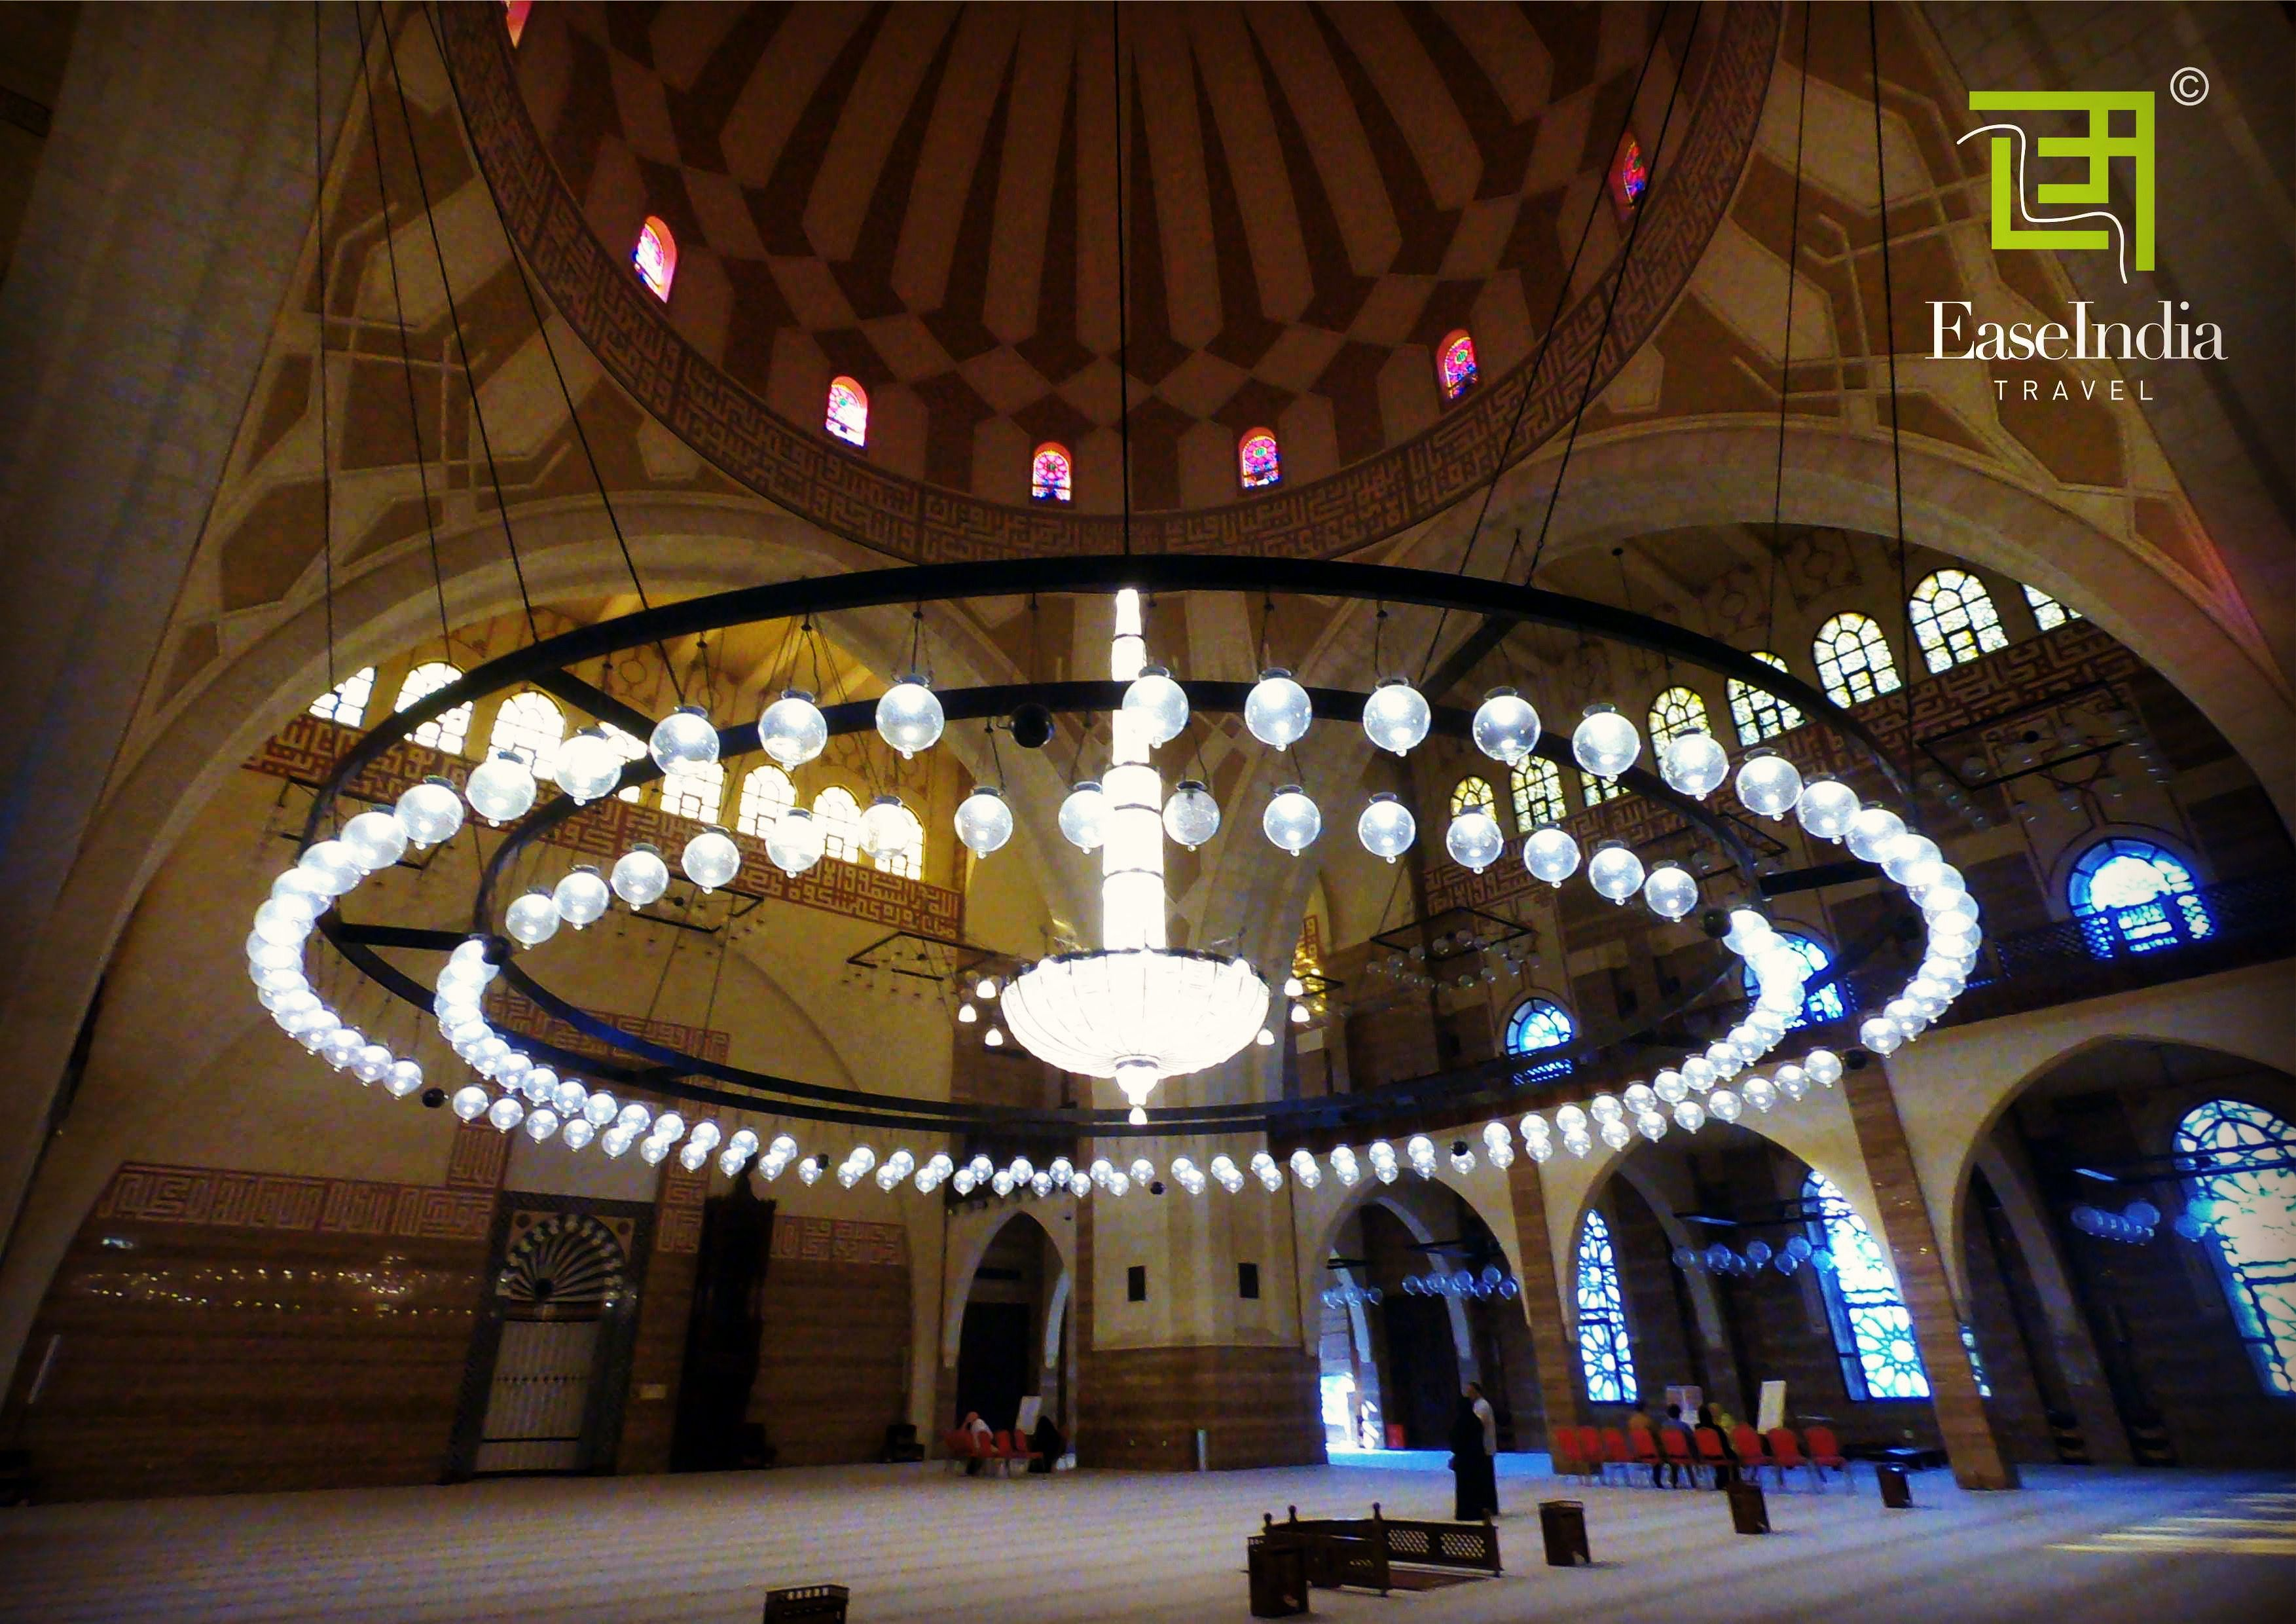 Stunning Chandelier In Bahrain Grand Mosque India Travel Bahrain